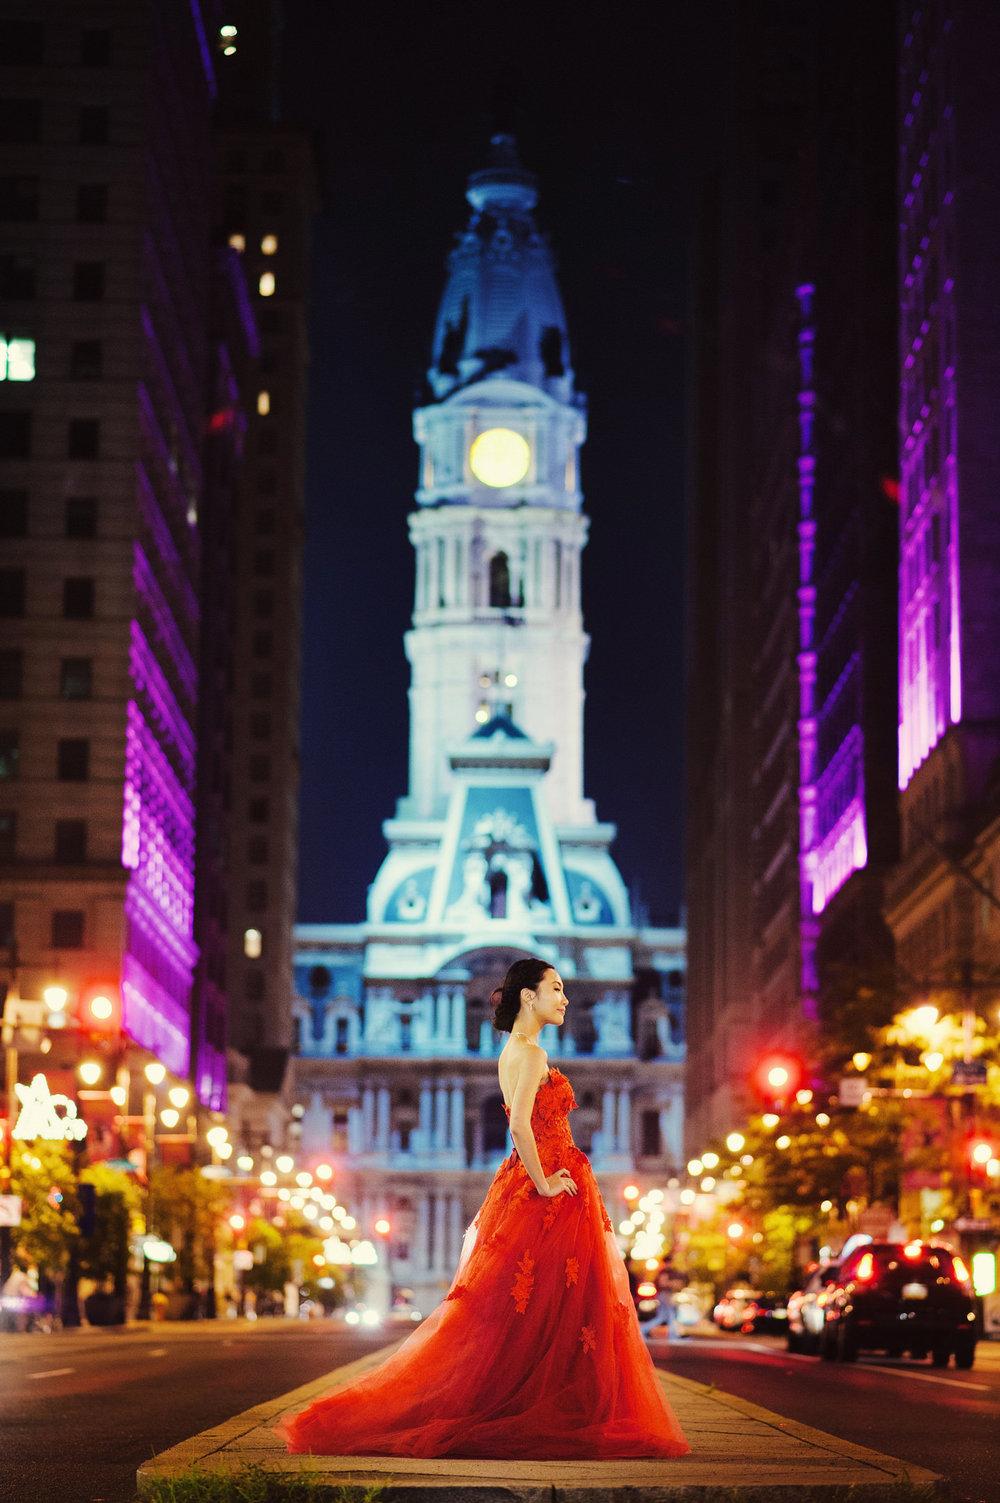 Chris_Hui_婚禮_婚紗照_pre_wedding_photography_best_008_Philadephia_city_hall_费城.jpg